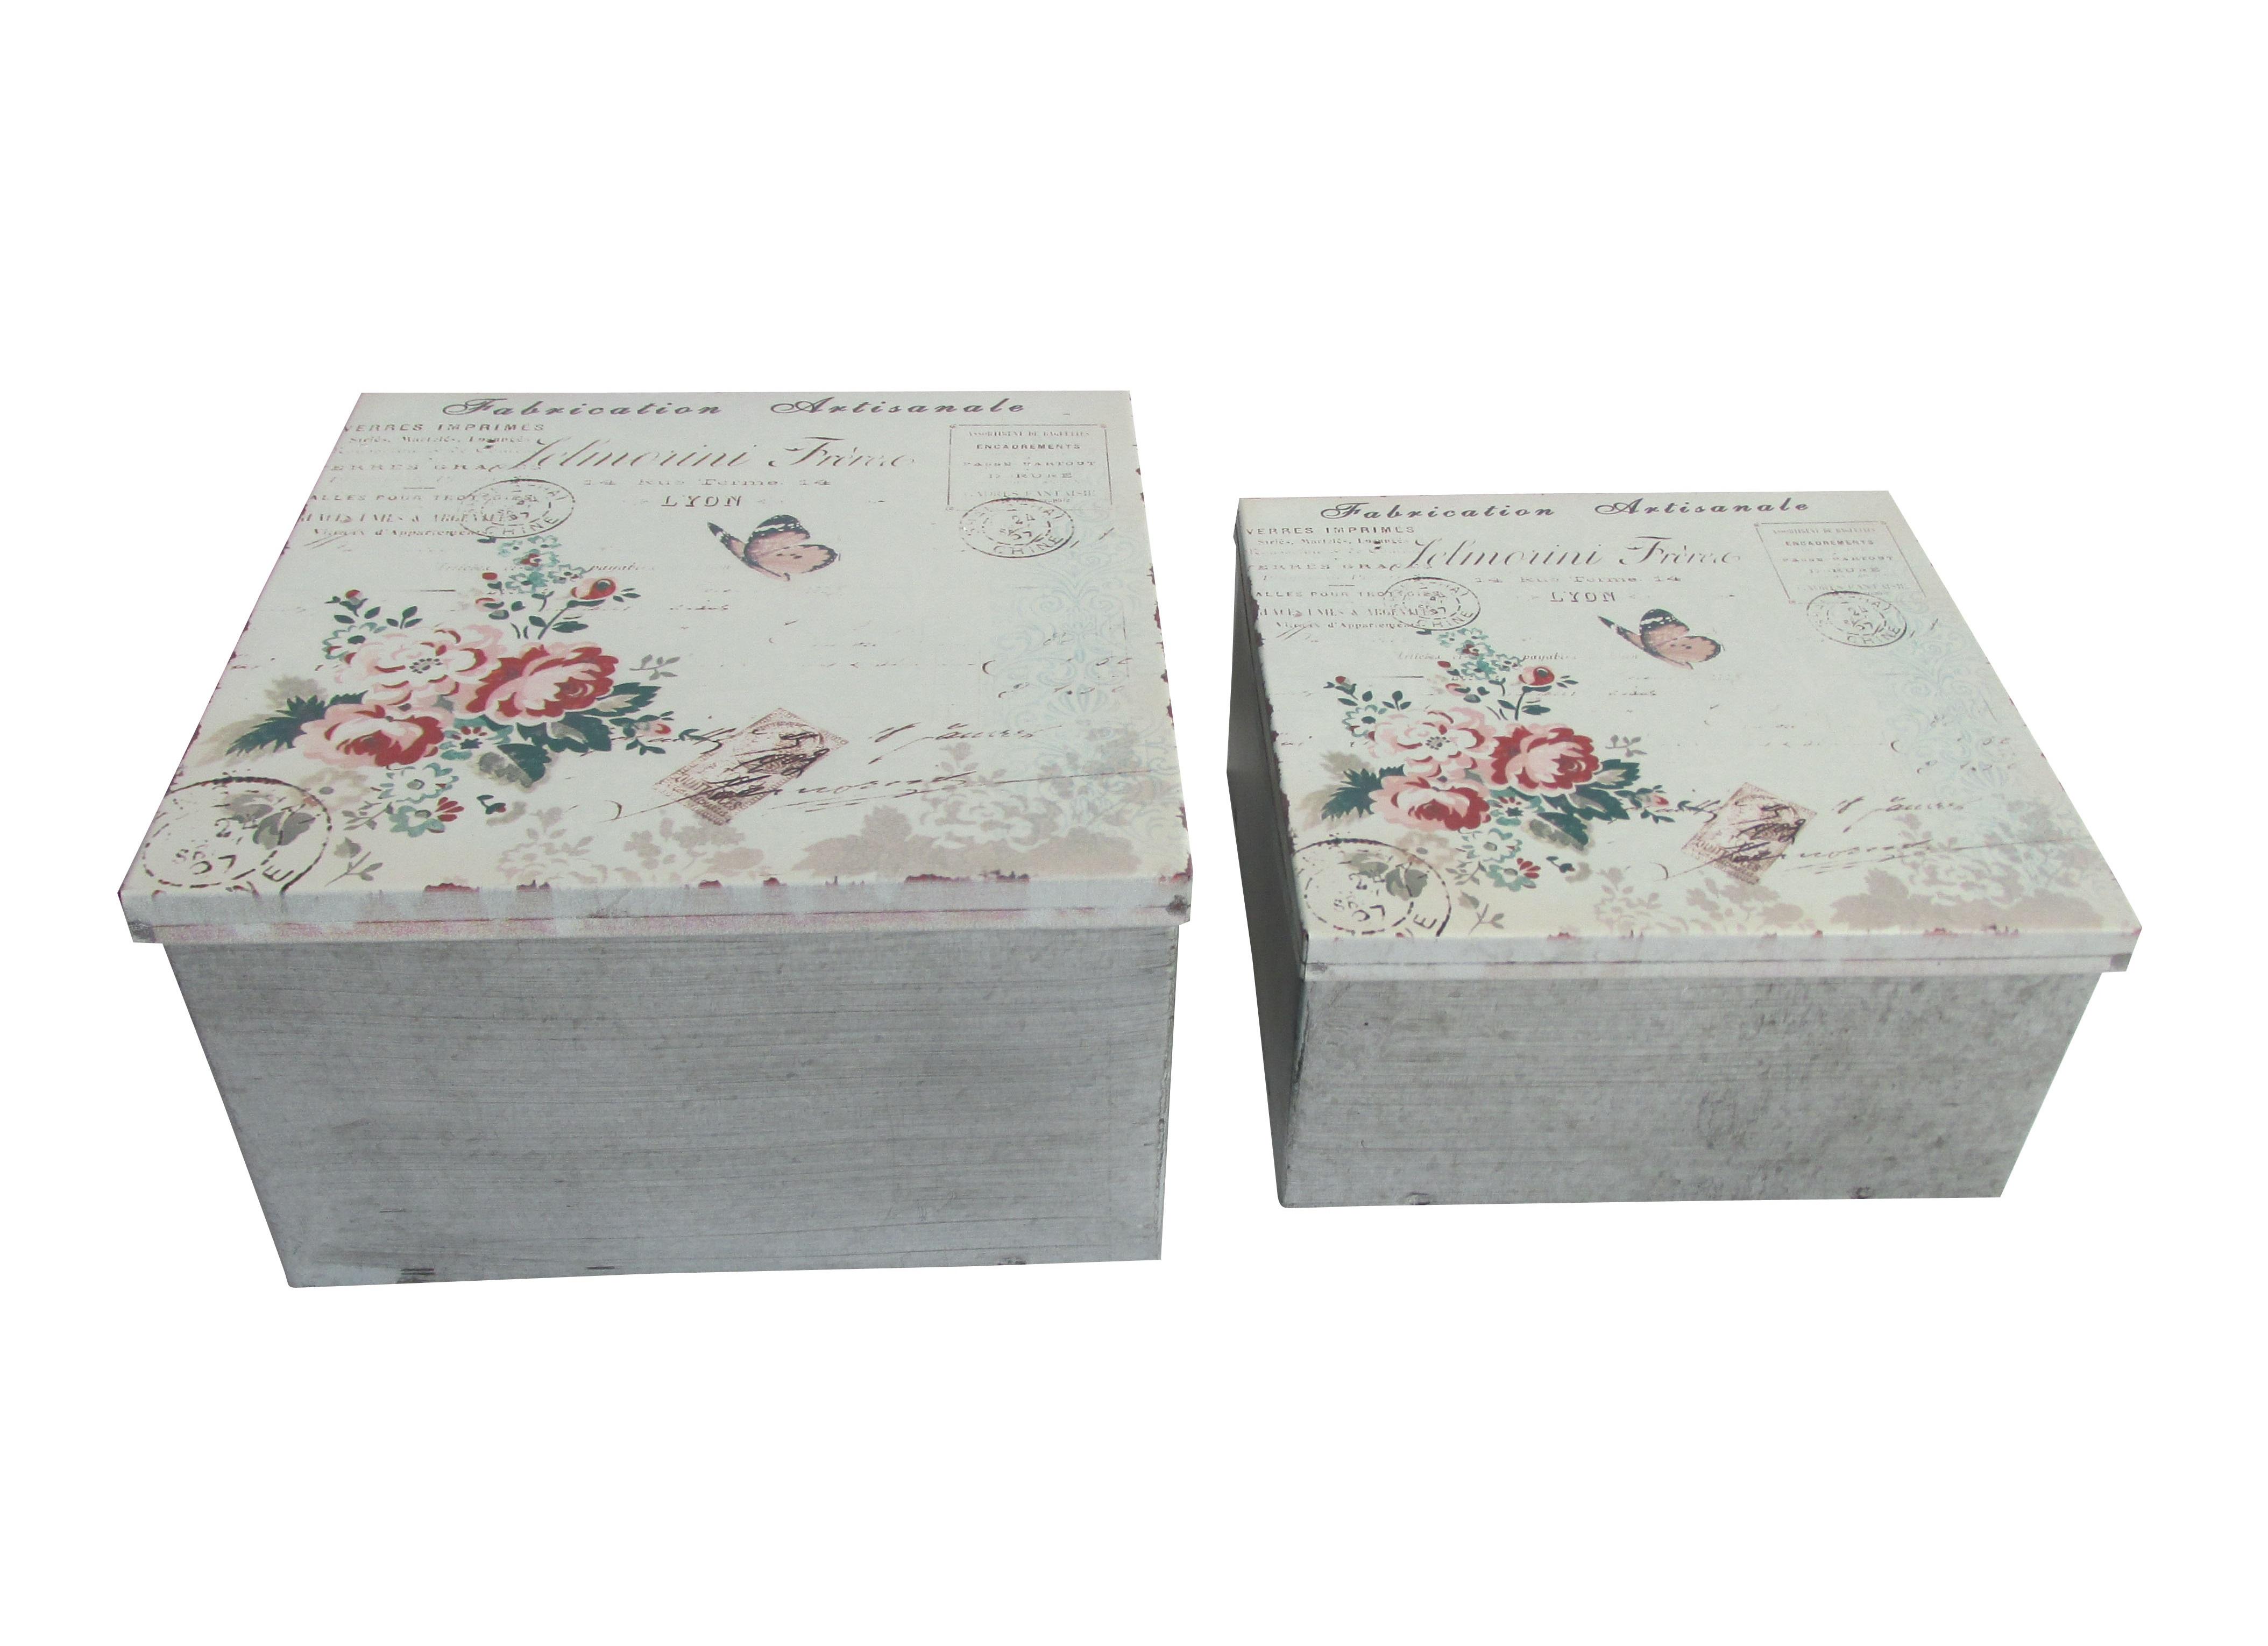 Набор из коробок Anges (2шт)Коробки<br>&amp;lt;div&amp;gt;Размеры:&amp;lt;/div&amp;gt;Большая коробка: &amp;amp;nbsp;10х18х18&amp;lt;div&amp;gt;Маленькая коробка: 16х16х8&amp;lt;br&amp;gt;&amp;lt;/div&amp;gt;&amp;lt;div&amp;gt;Материал: Цинк&amp;lt;/div&amp;gt;<br><br>Material: Металл<br>Ширина см: 18<br>Высота см: 10<br>Глубина см: 18